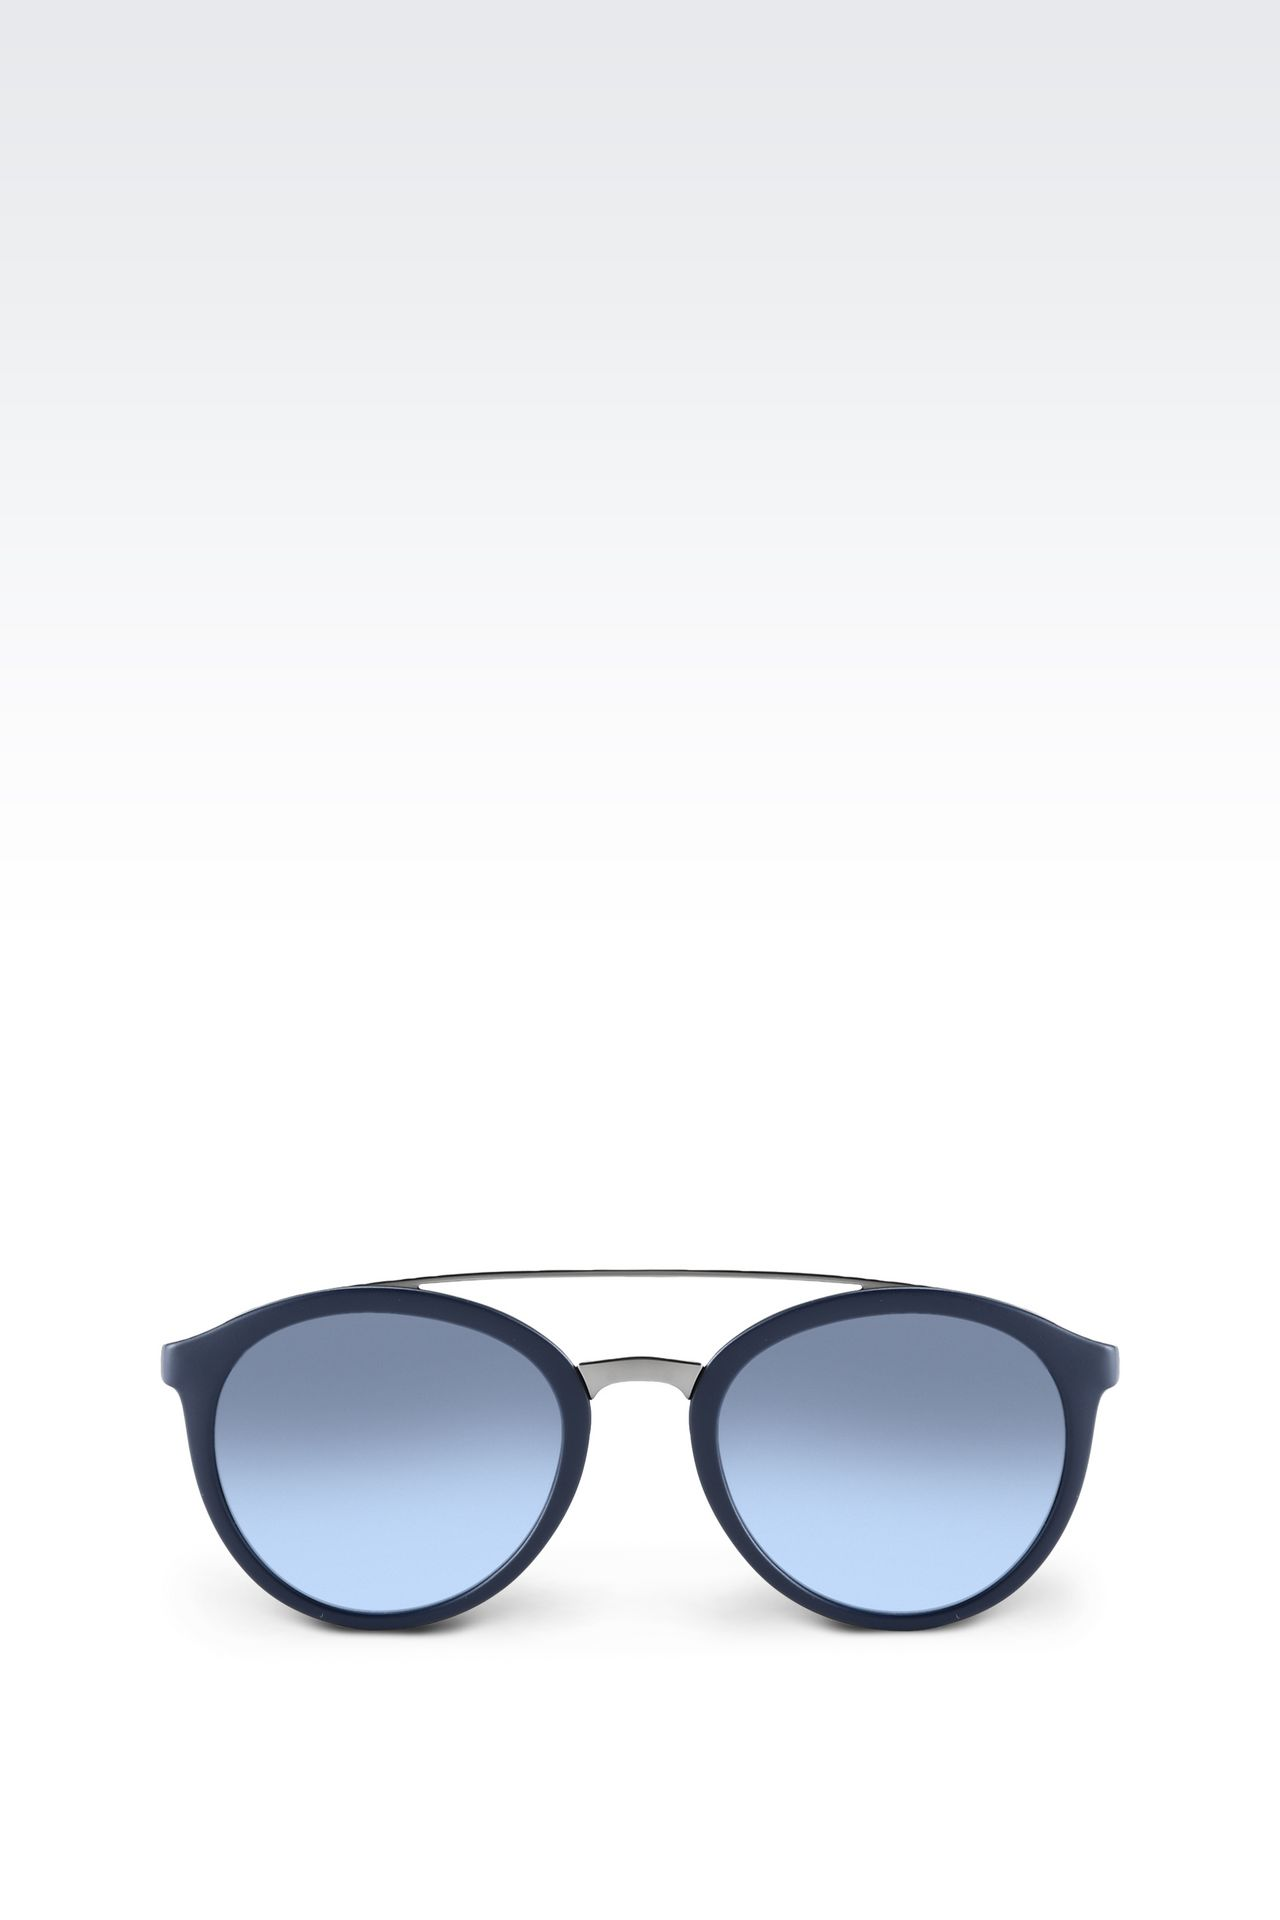 GIORGIO ARMANI FRAMES OF LIFE COLLECTION SUNGLASSES: sunglasses Women by Armani - 0